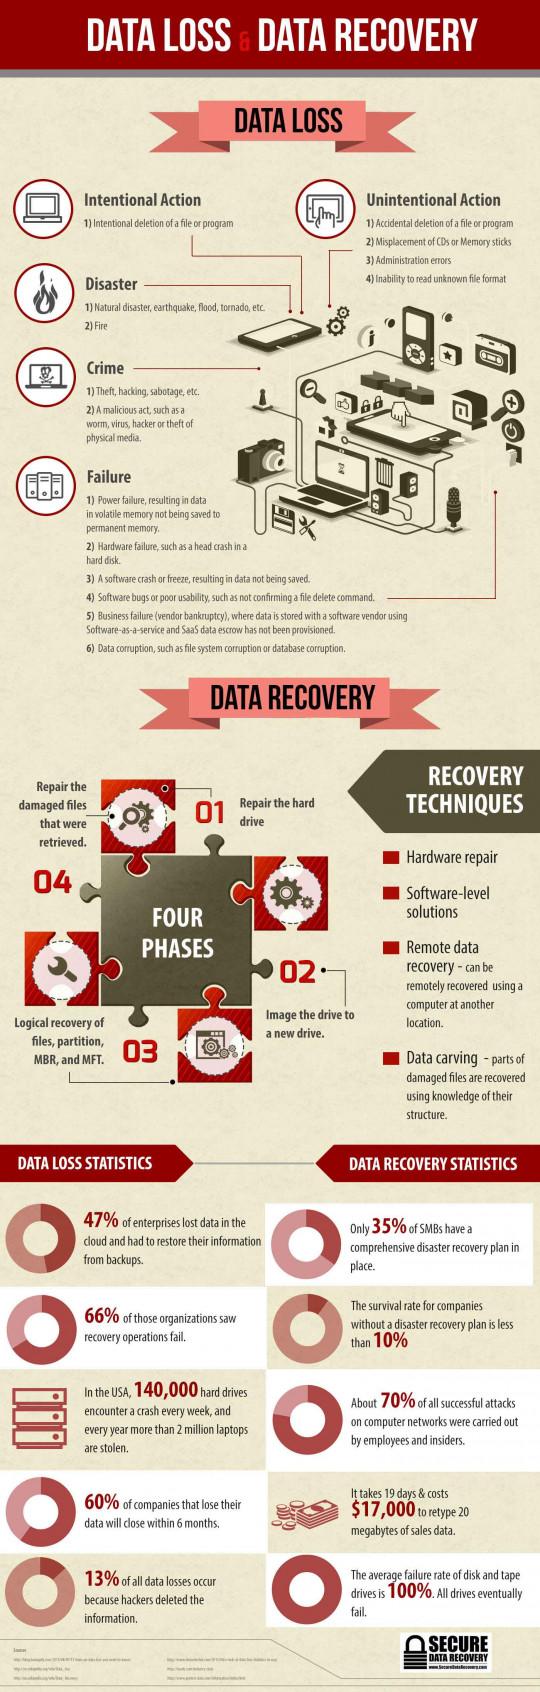 Data Loss & Data Recovery